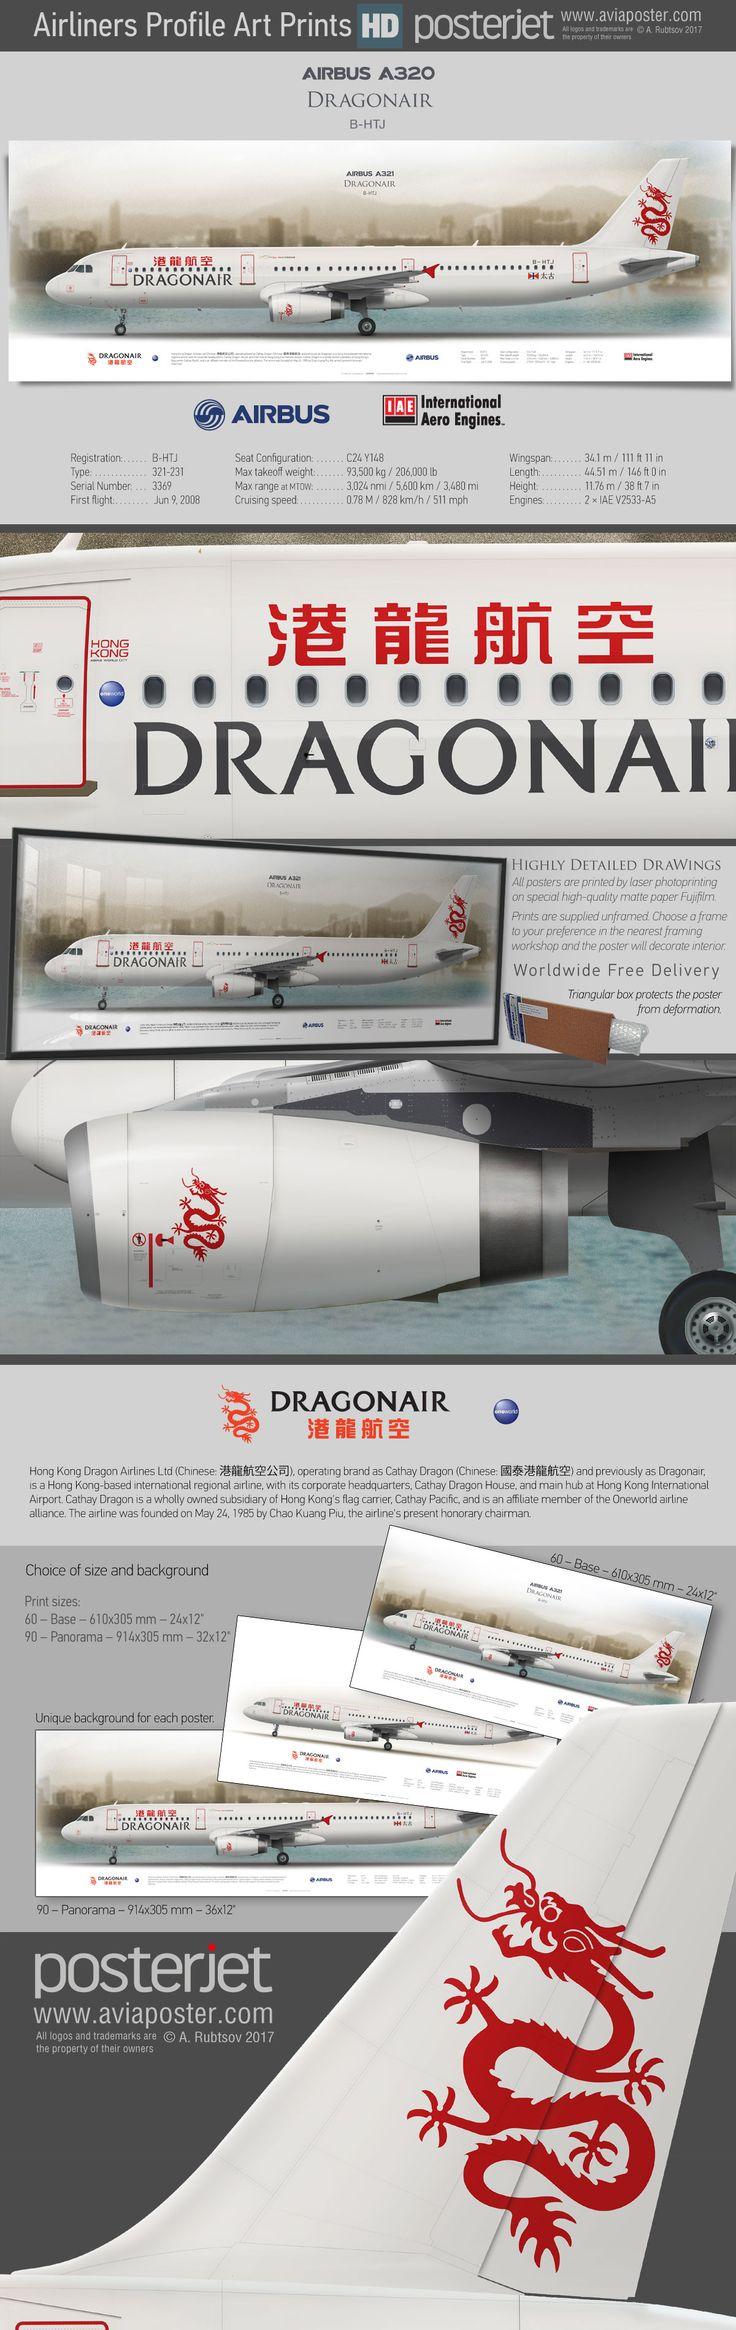 Airbus A321 Dragonair B-HTJ   www.aviaposter.com   #aviation #jetliner #airplane #pilot #aviationlovers #avgeek #jet #airport #pilotlife #cabincrew